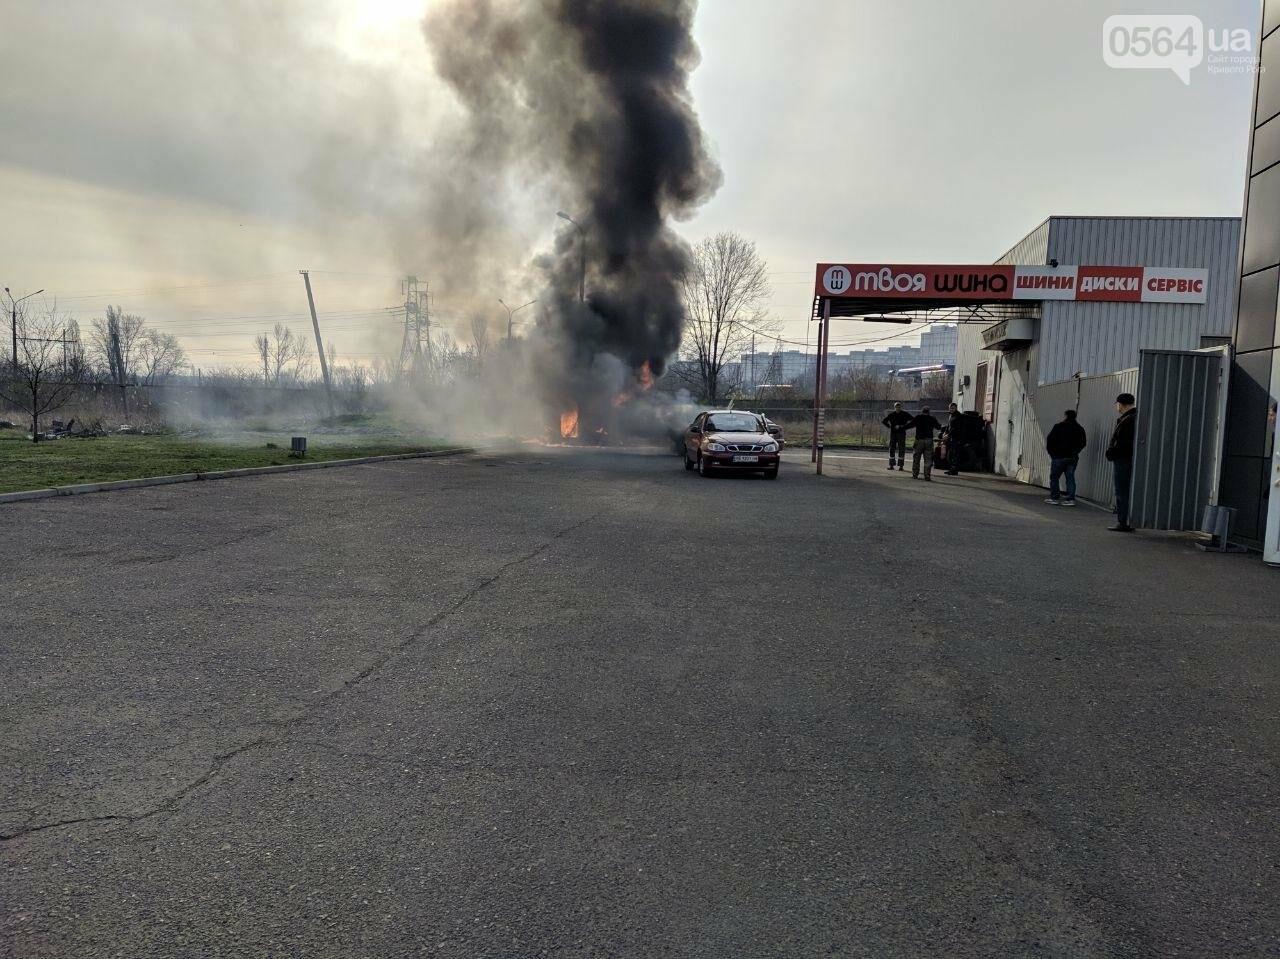 В Кривом Роге возле автомойки загорелся автомобиль, - ФОТО , фото-1